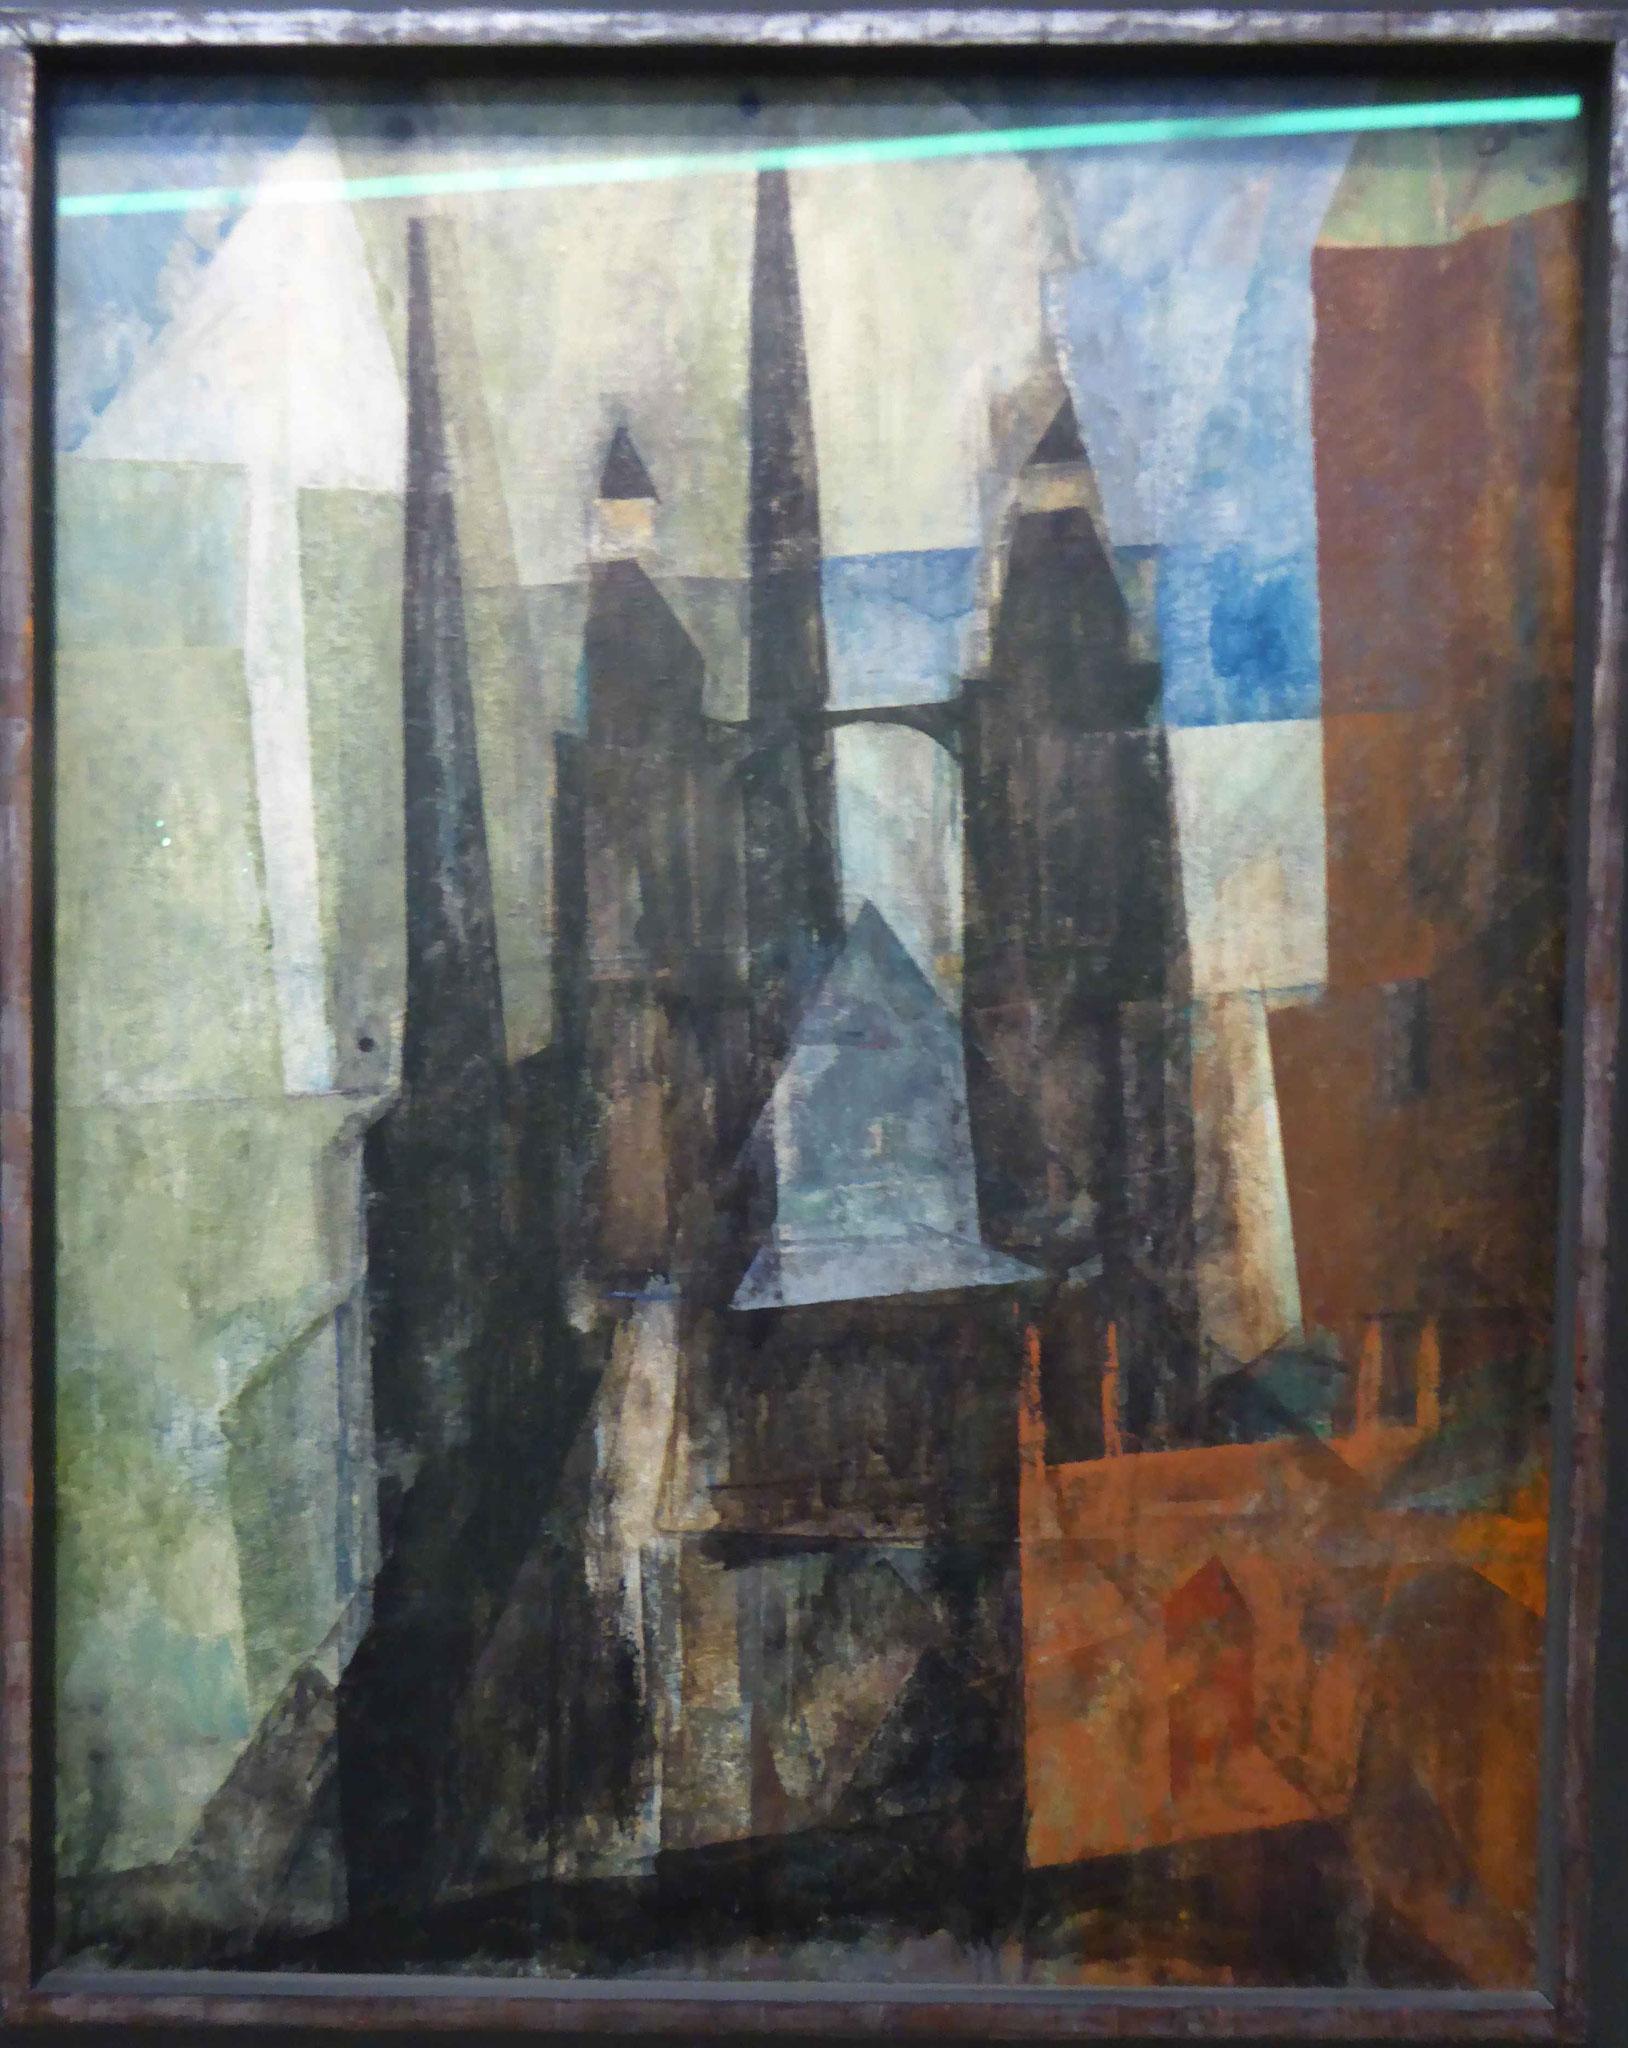 Lyonel Feininger, Marienkirche mit Pfeil, 1930,  Museum Moritzburg, Halle